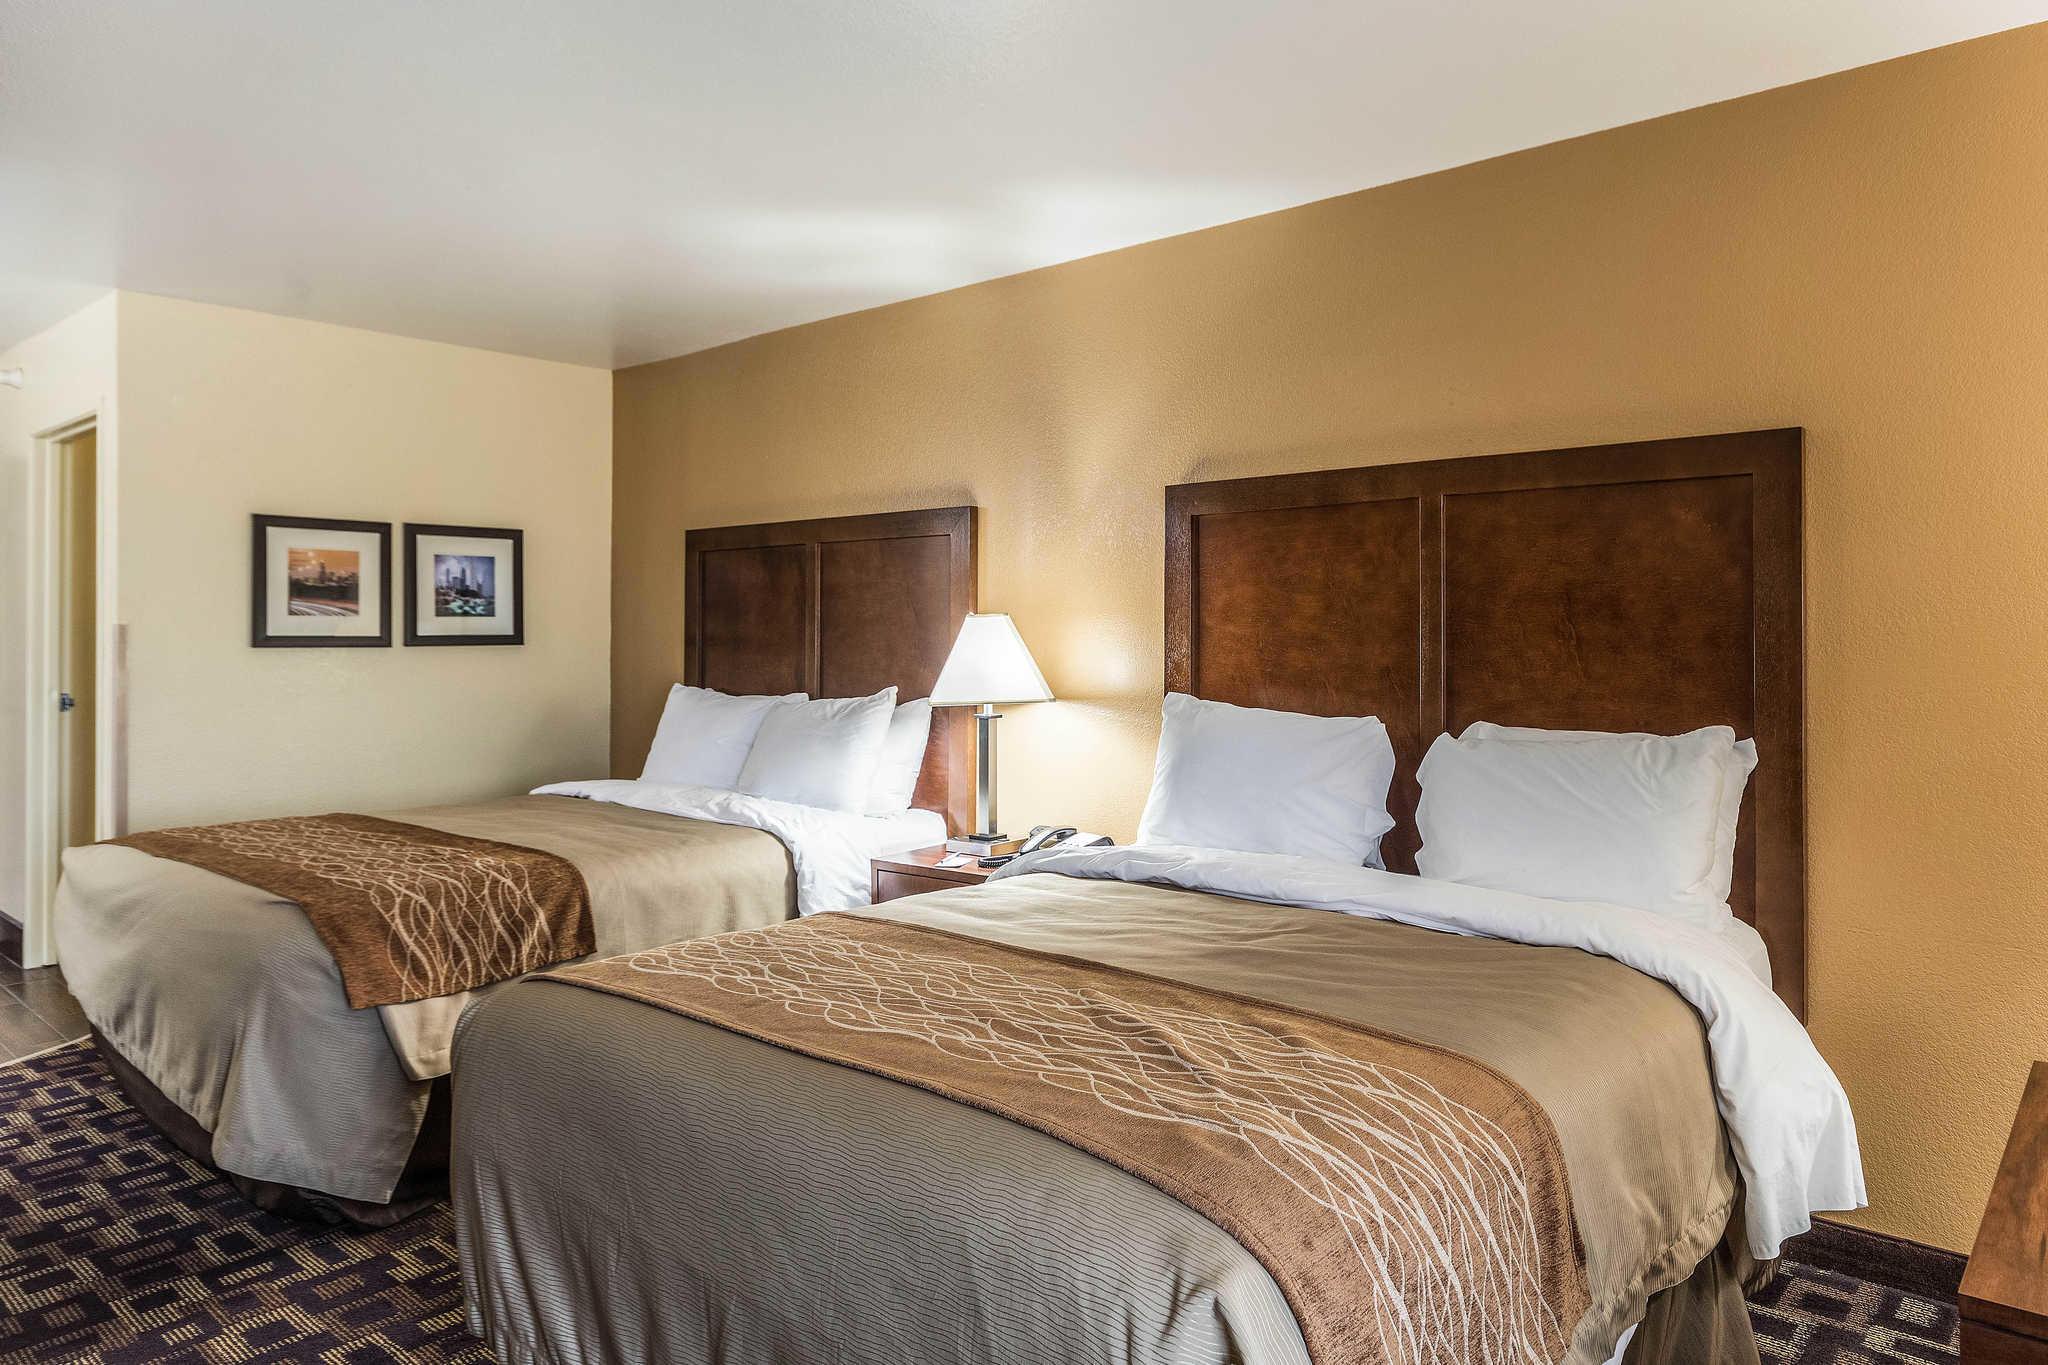 Comfort Inn & Suites North Aurora - Naperville image 13